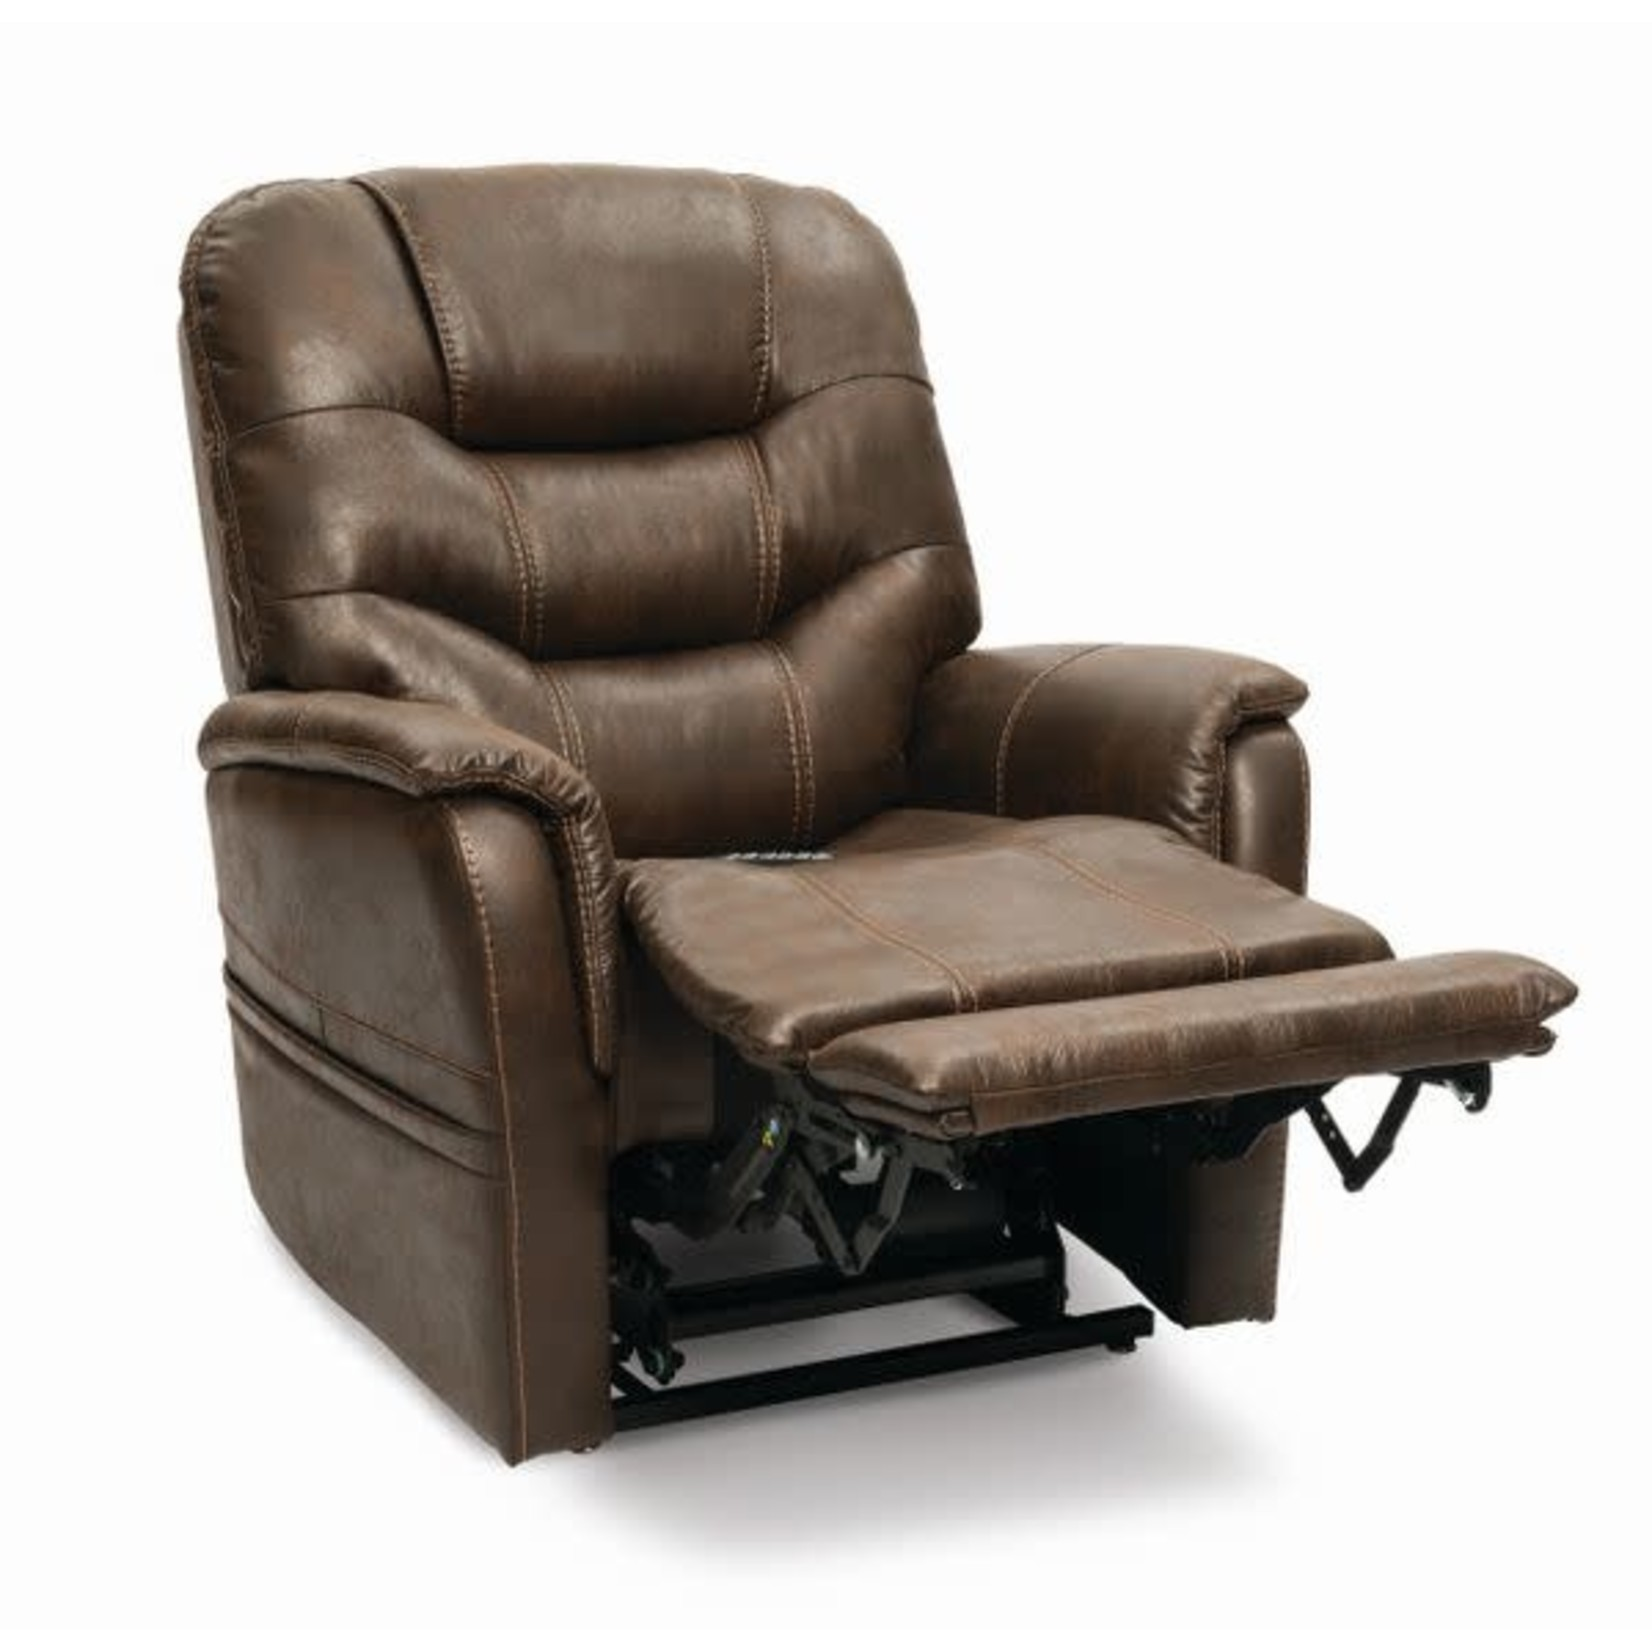 Pride Pre-owned Elegance Lift Chair Large Badlands Walnut